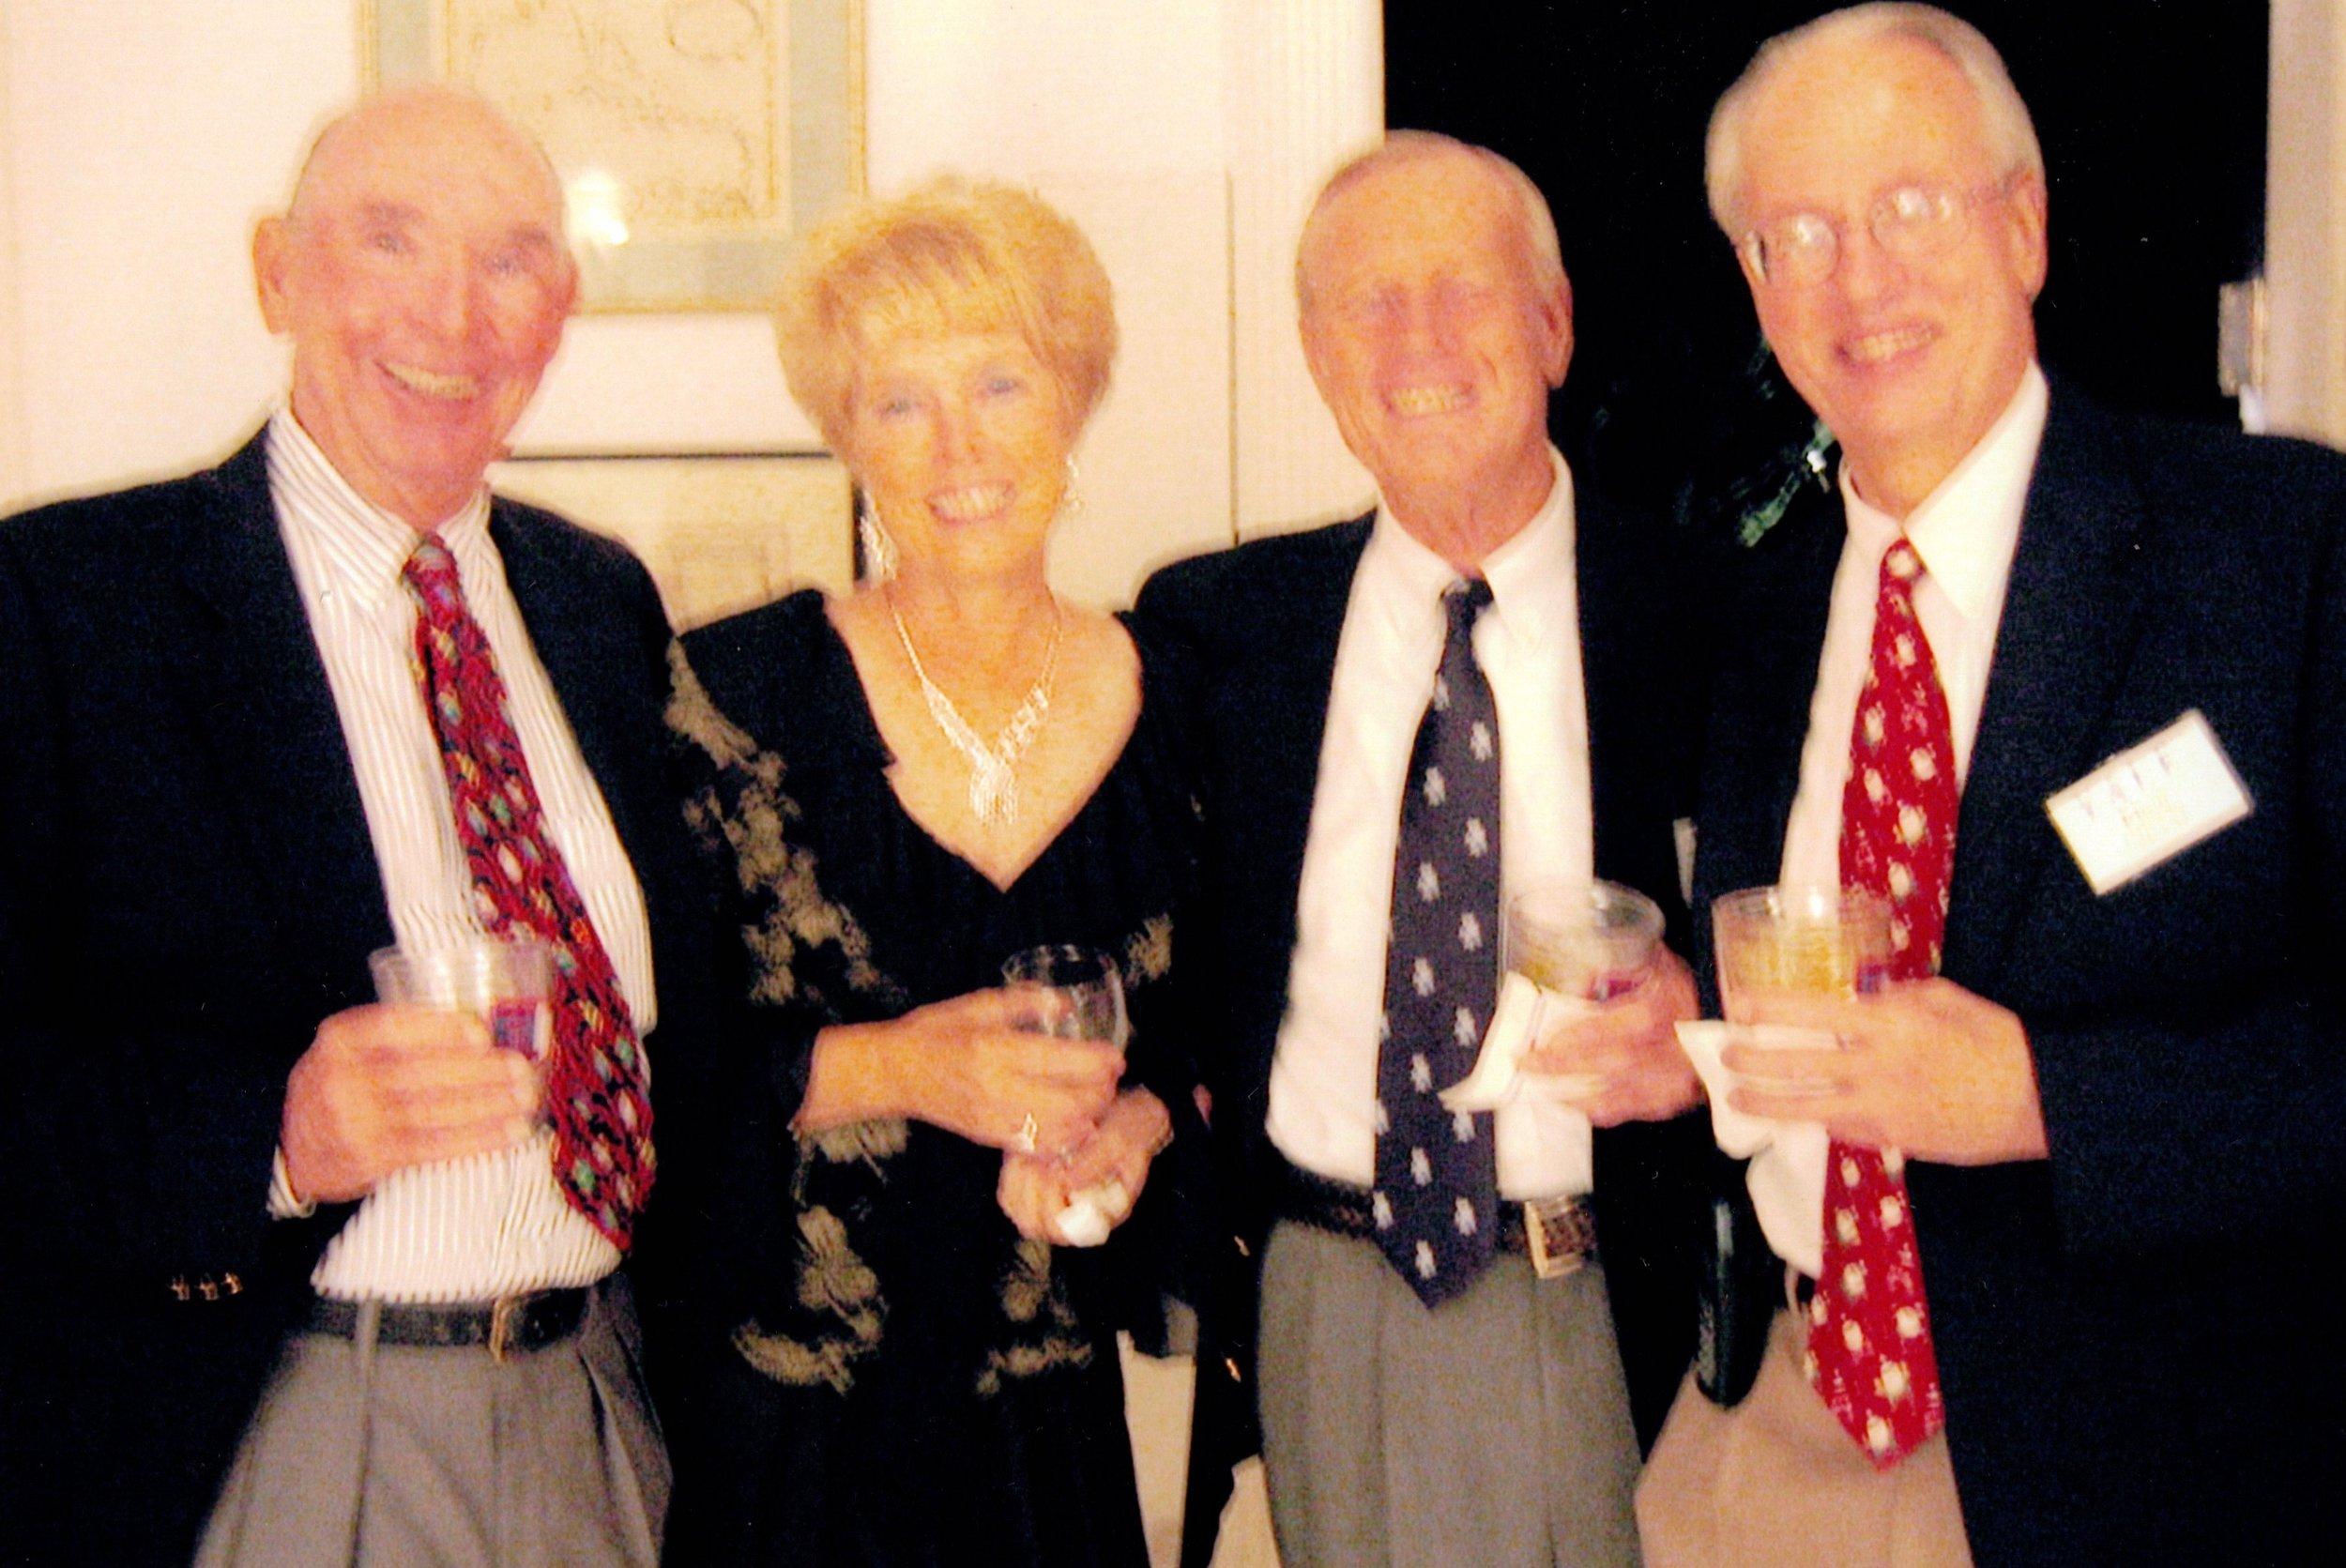 JAY AND JEANNE GELINAS, TERRY UPSON, ELTON LEHEUR